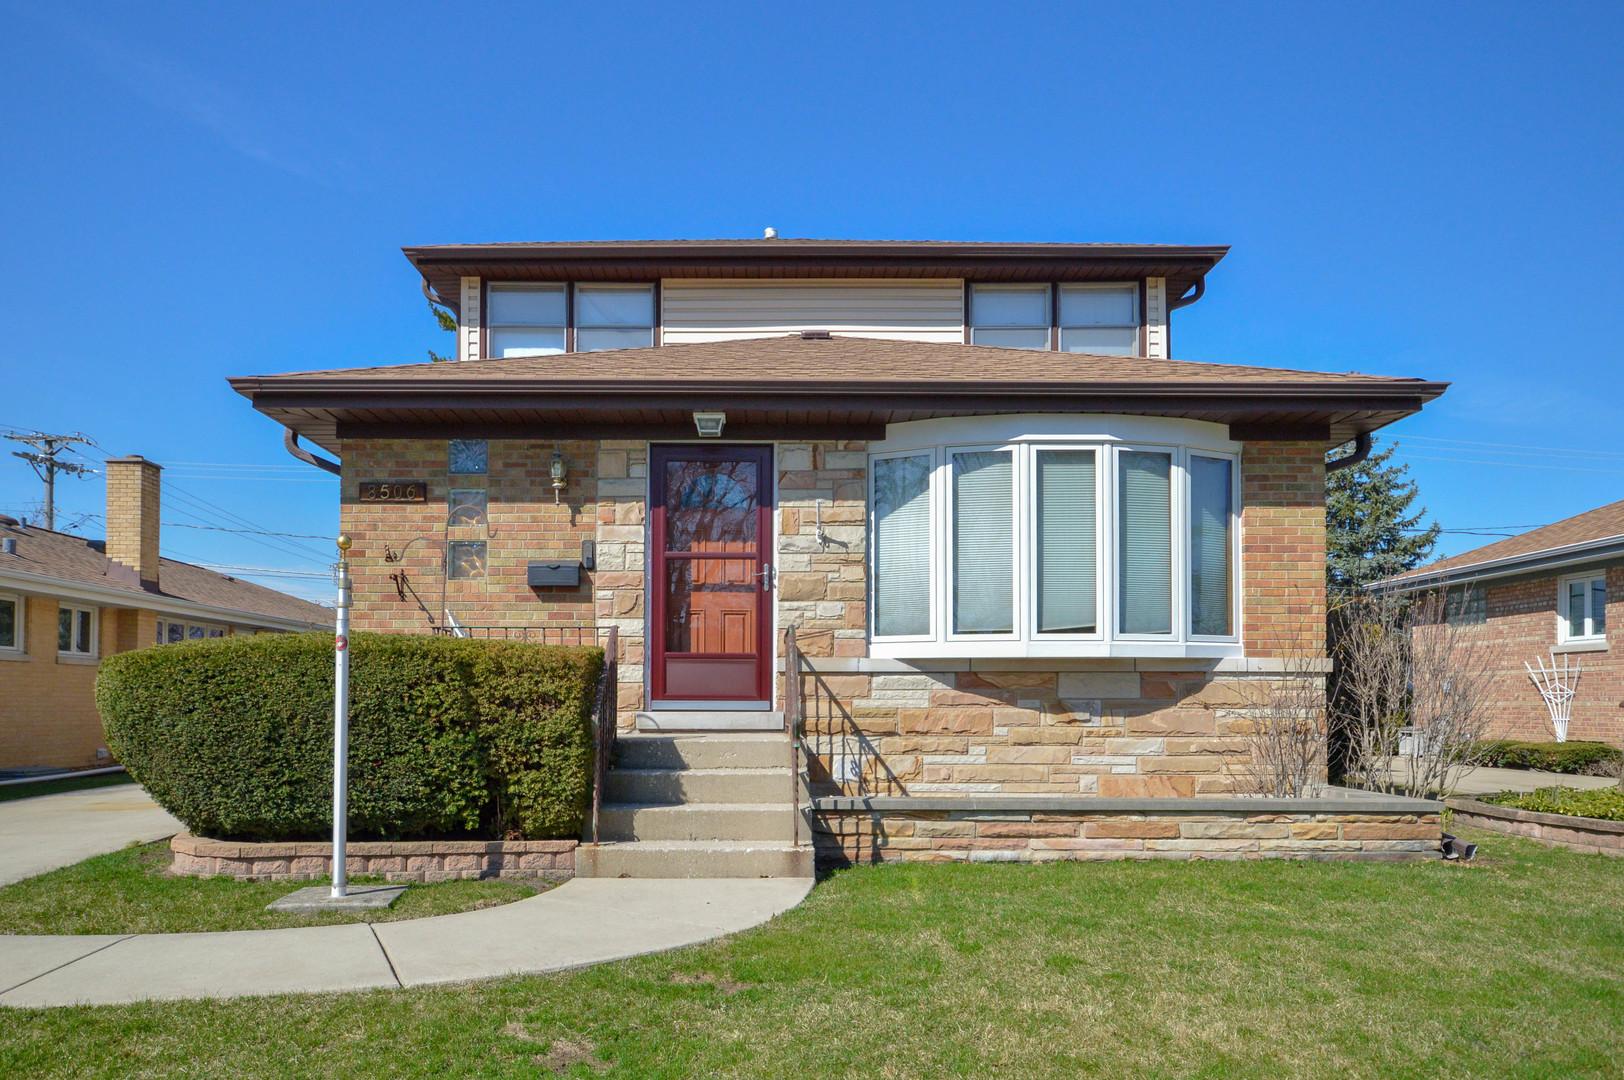 8506 North Oriole Avenue, Niles, Illinois